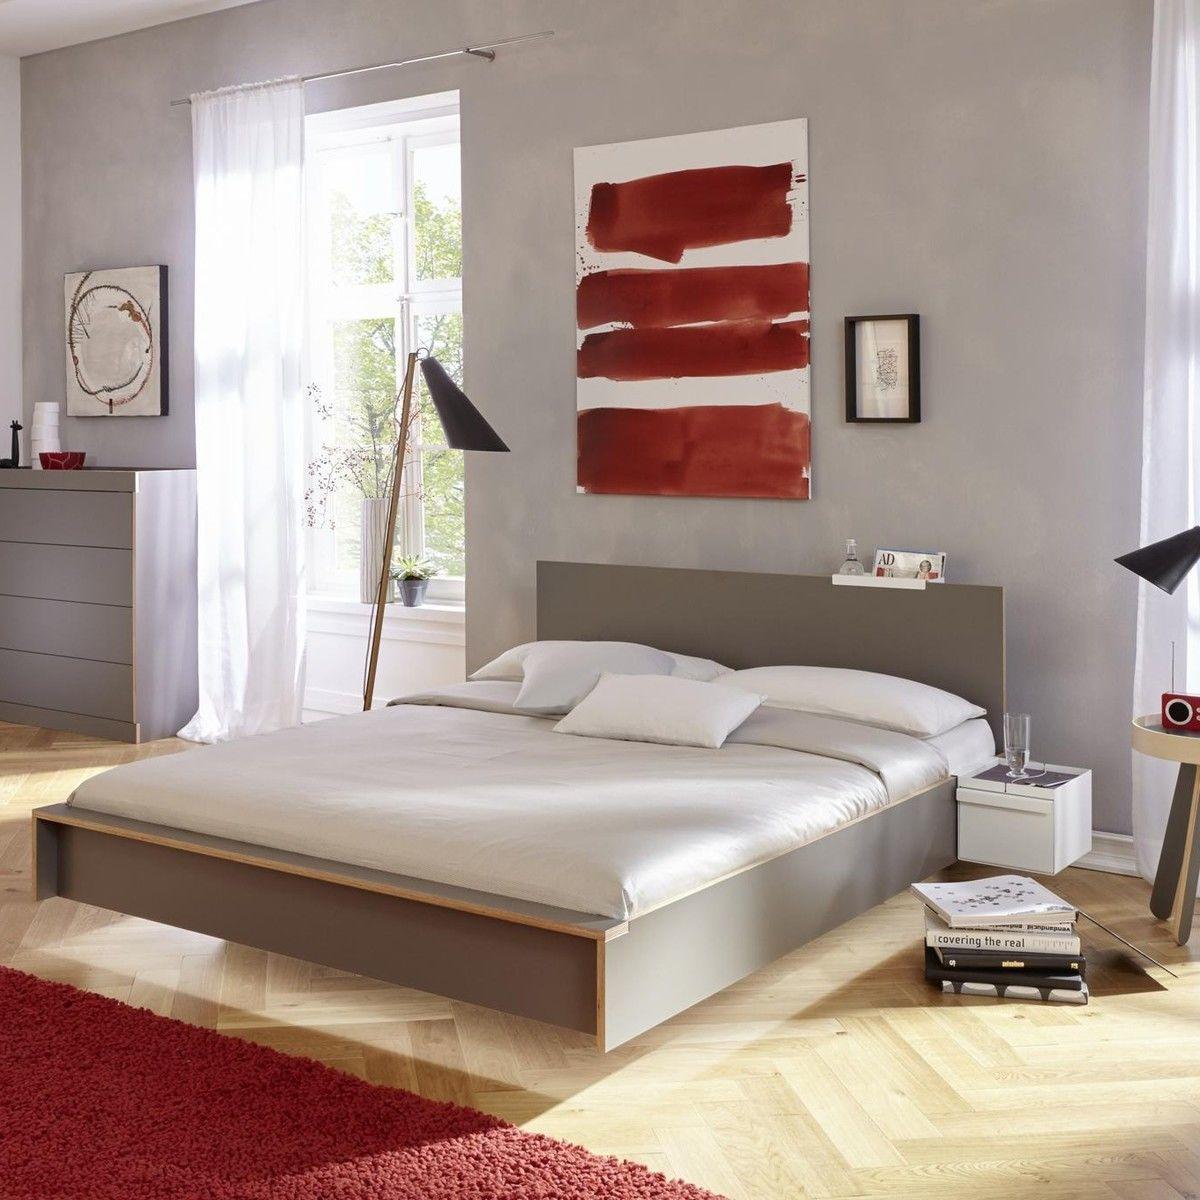 flai lit deux places m ller m belwerkst tten. Black Bedroom Furniture Sets. Home Design Ideas